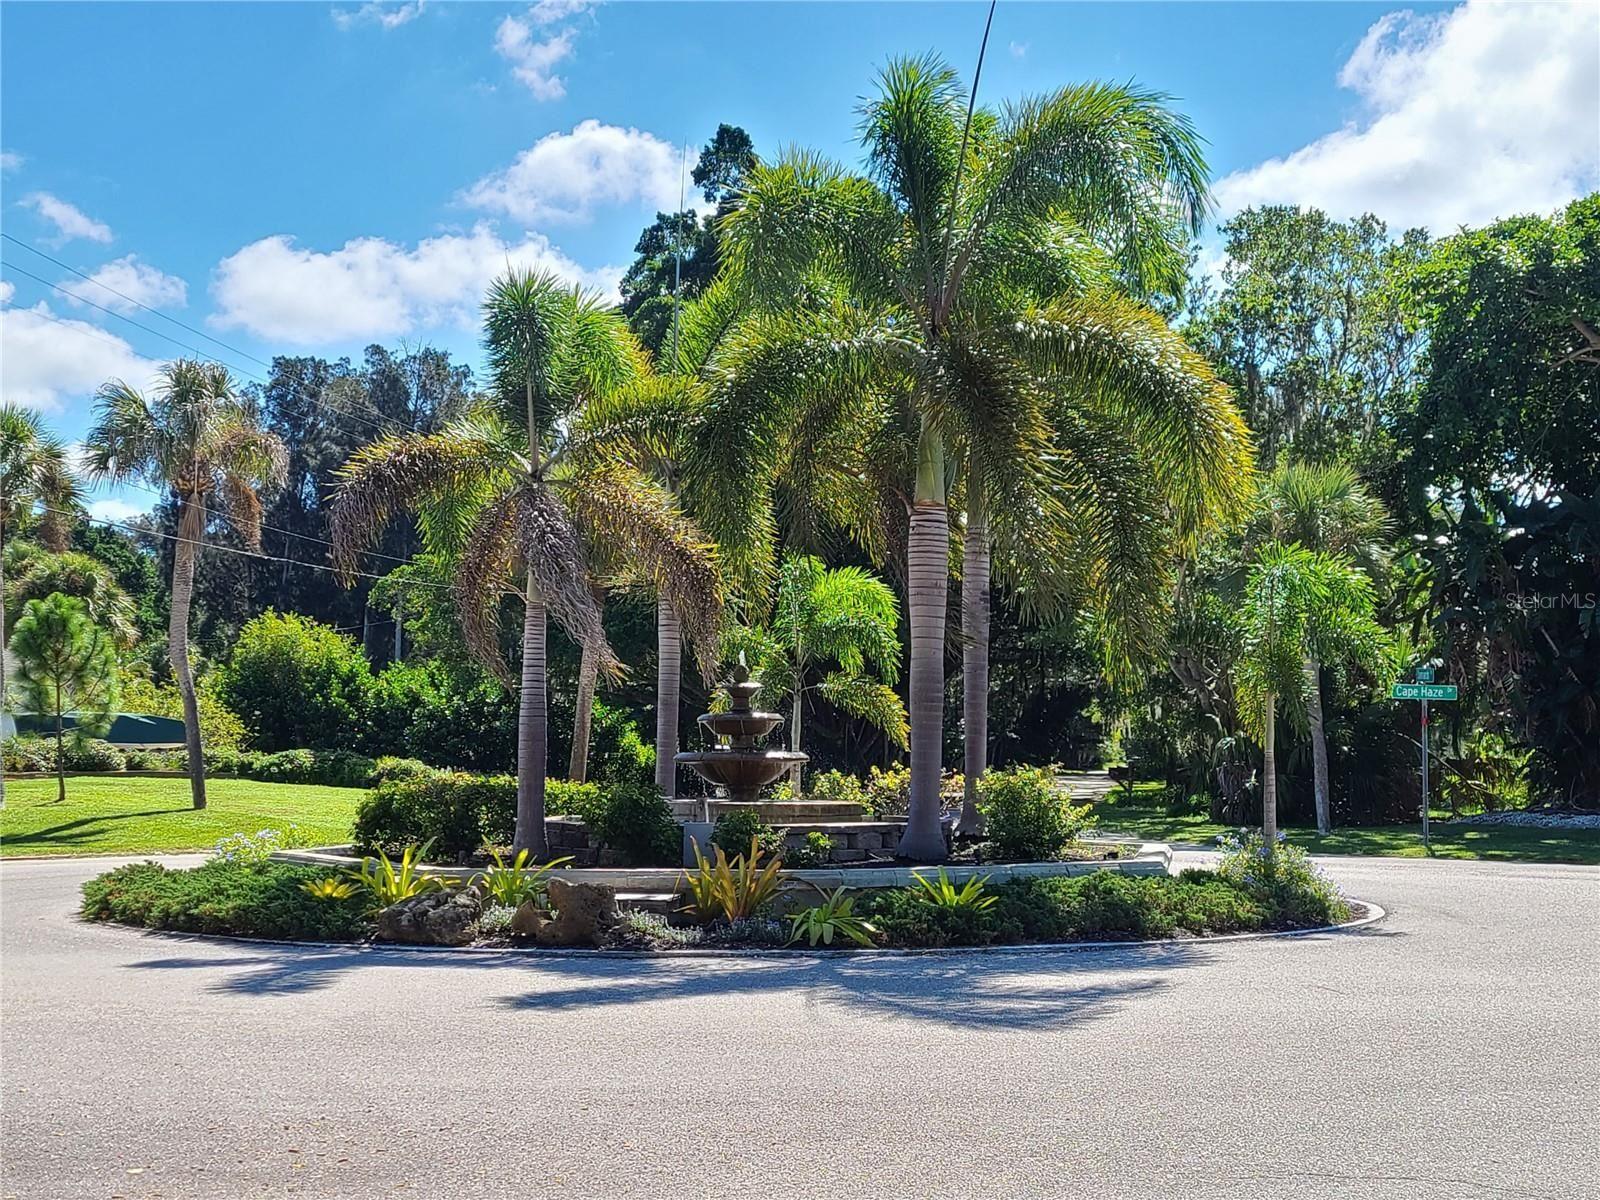 Photo of 170 SPYGLASS ALLEY, PLACIDA, FL 33946 (MLS # D6121563)